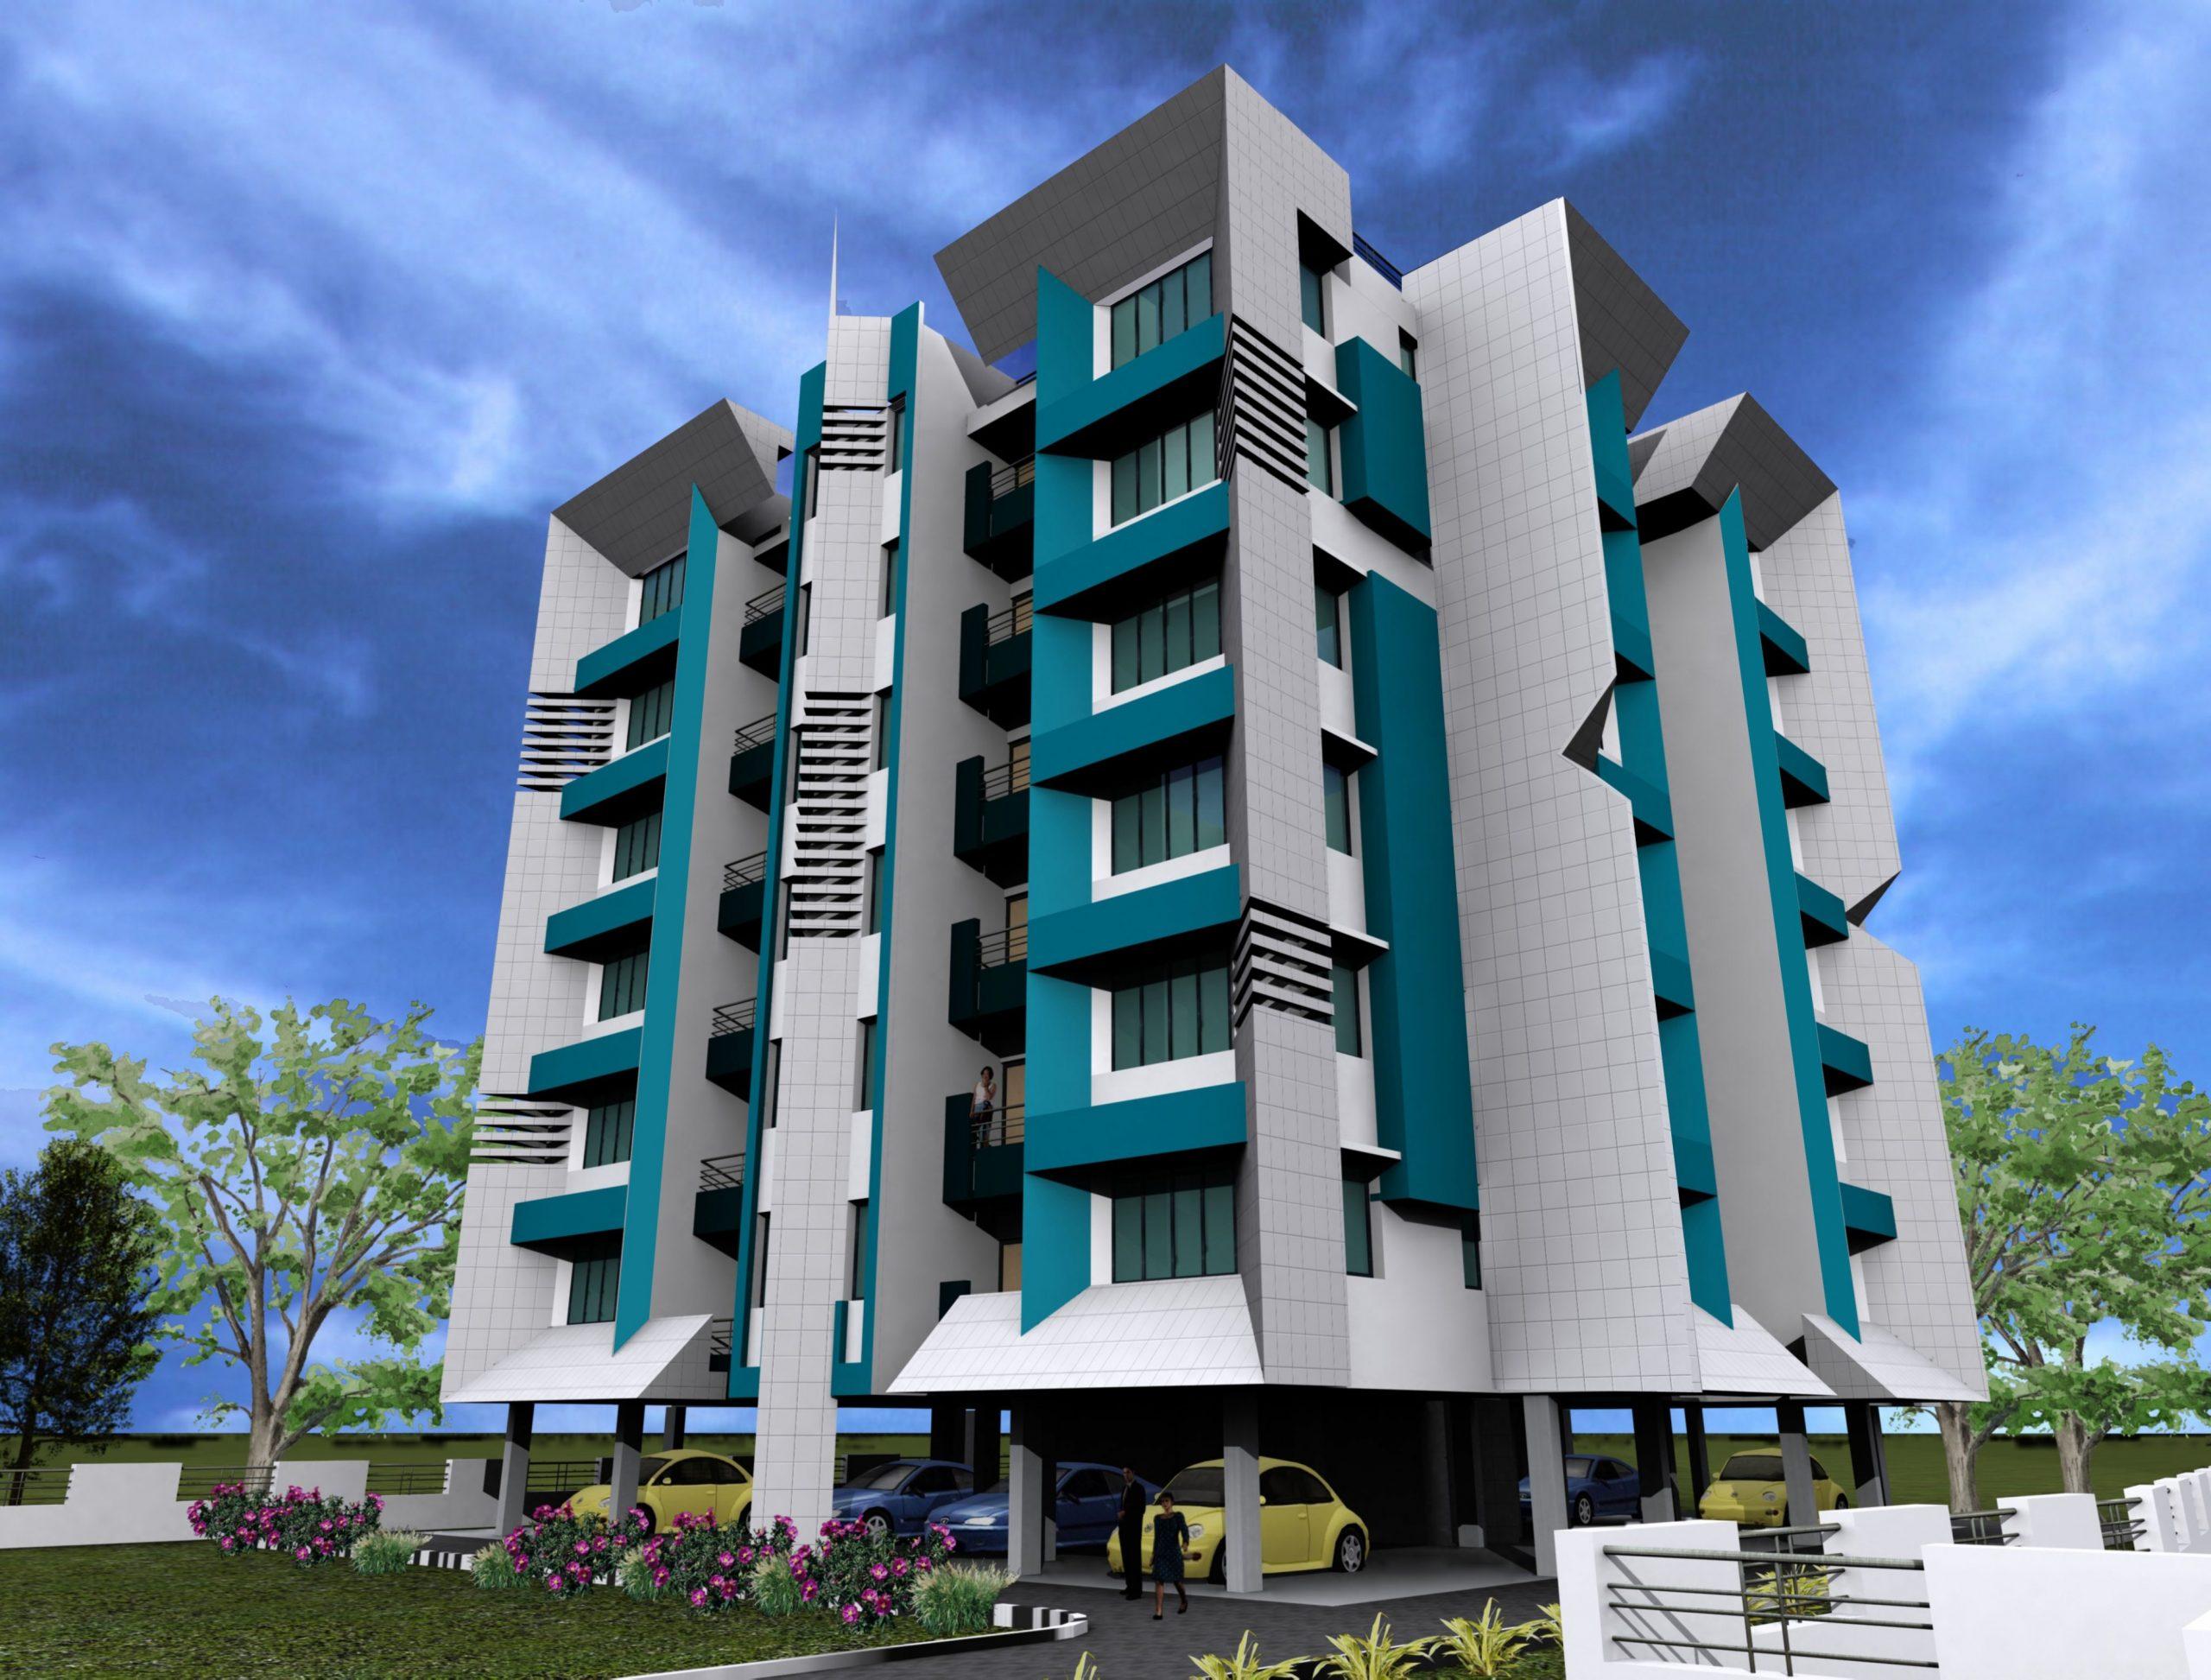 Architecture Page 12 Apartment Condo Interior Design House  - Apartment Design Building